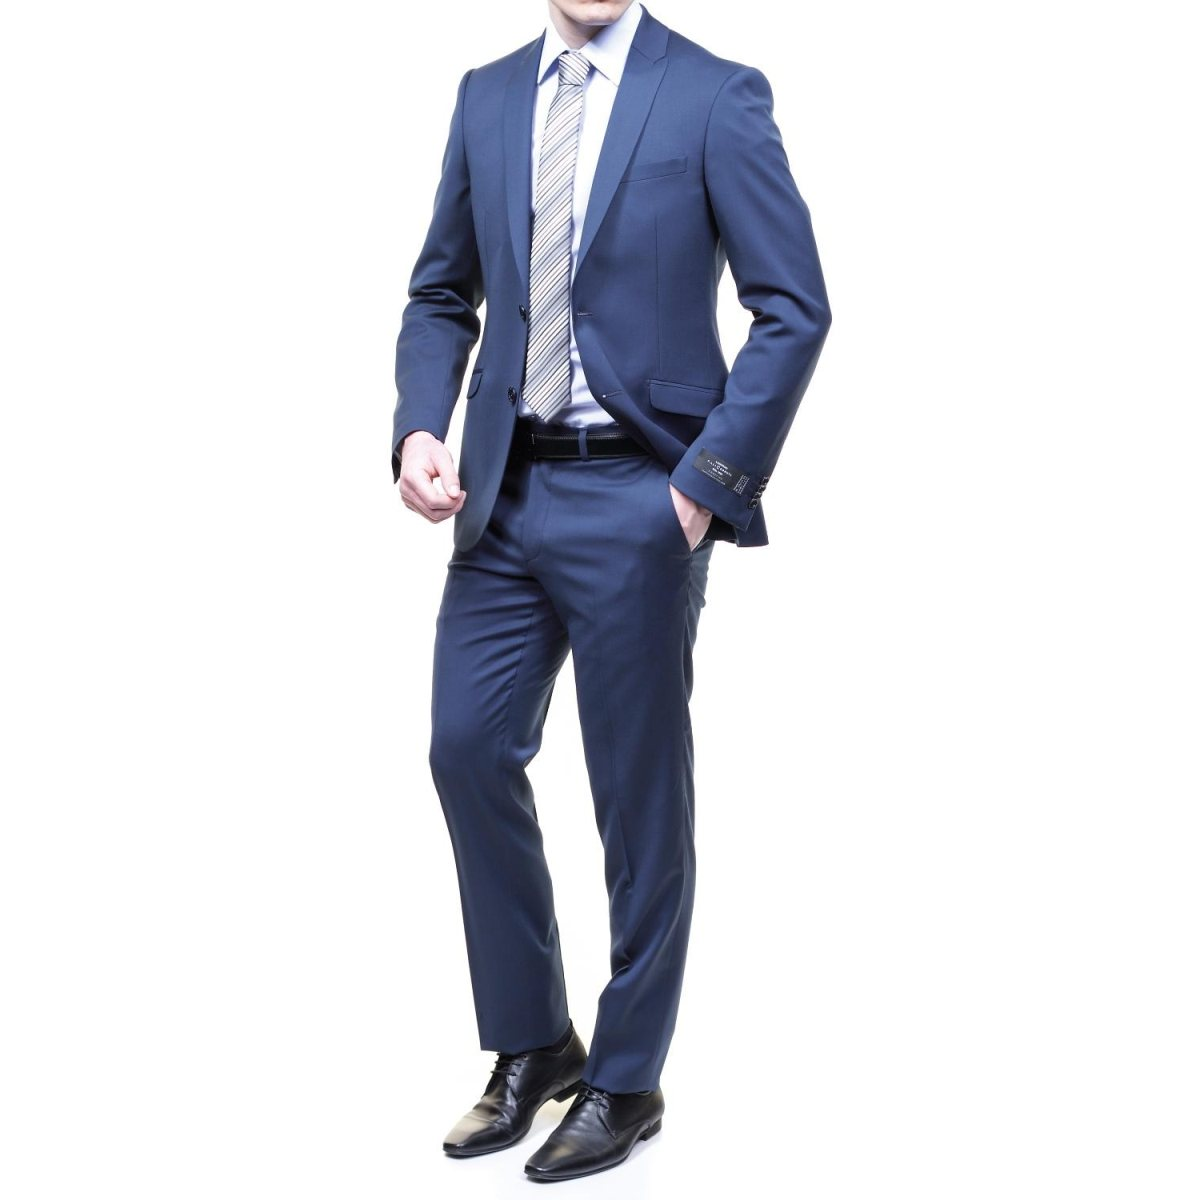 costume bleu roi homme costume mariage homme bleu roi costume mode et sappe costume bleu roi. Black Bedroom Furniture Sets. Home Design Ideas